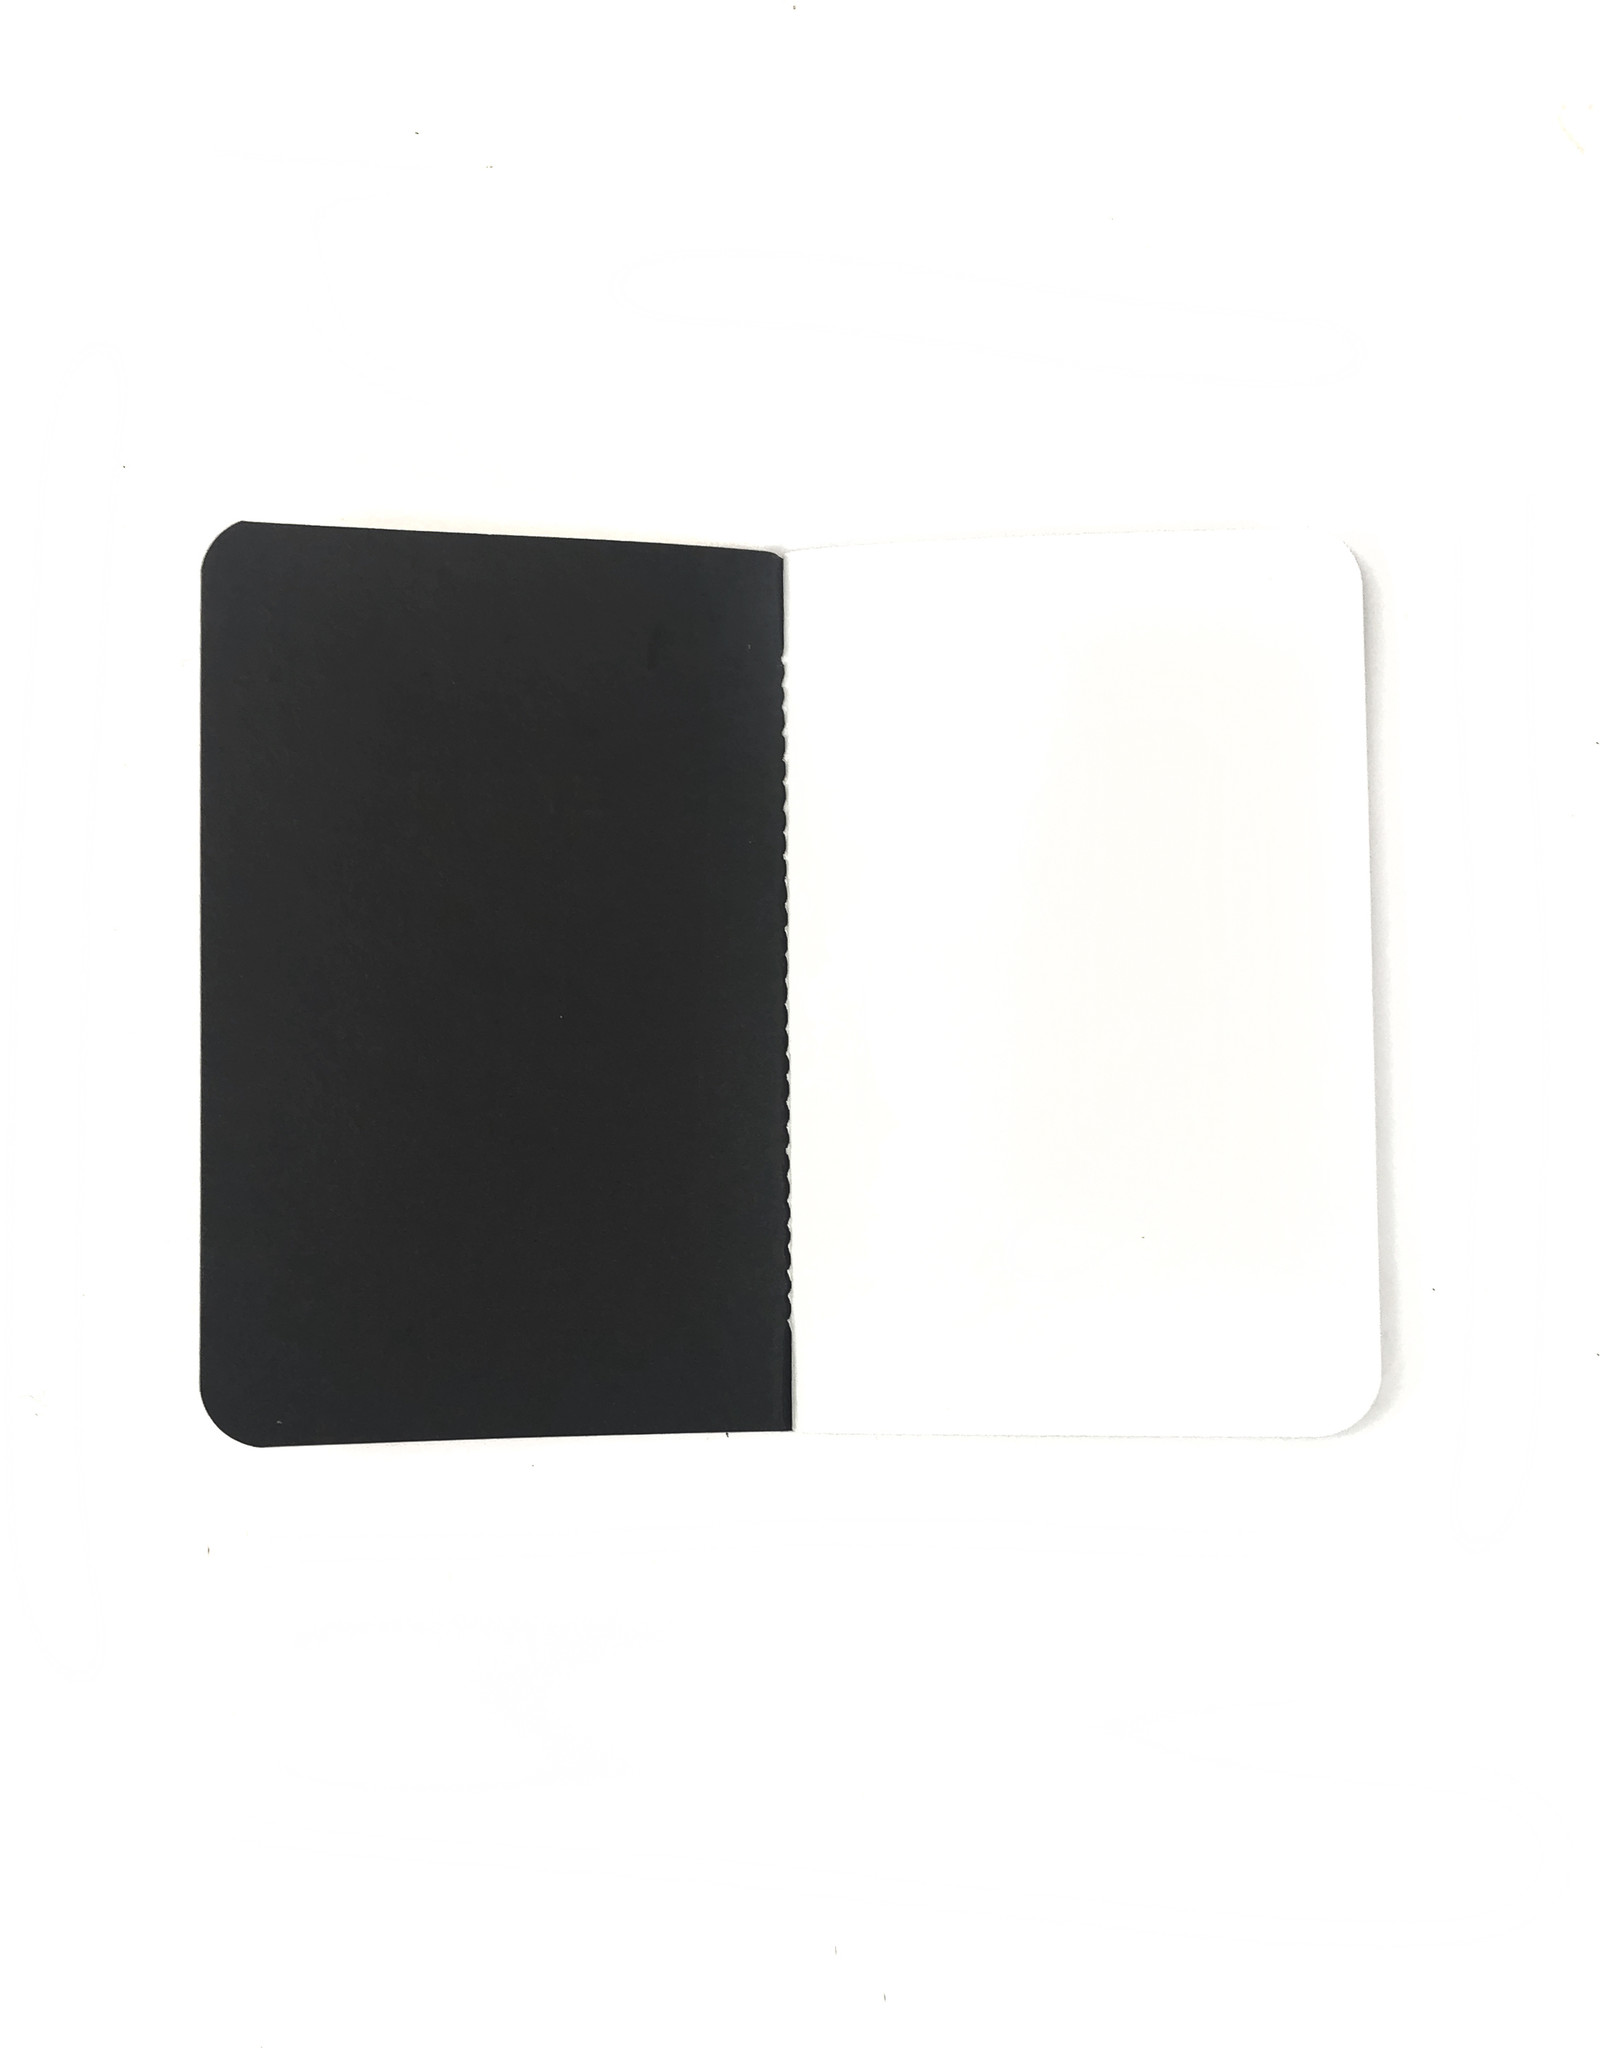 Soft Cover Notebook 9x14 cm, Curiosities quiet grey